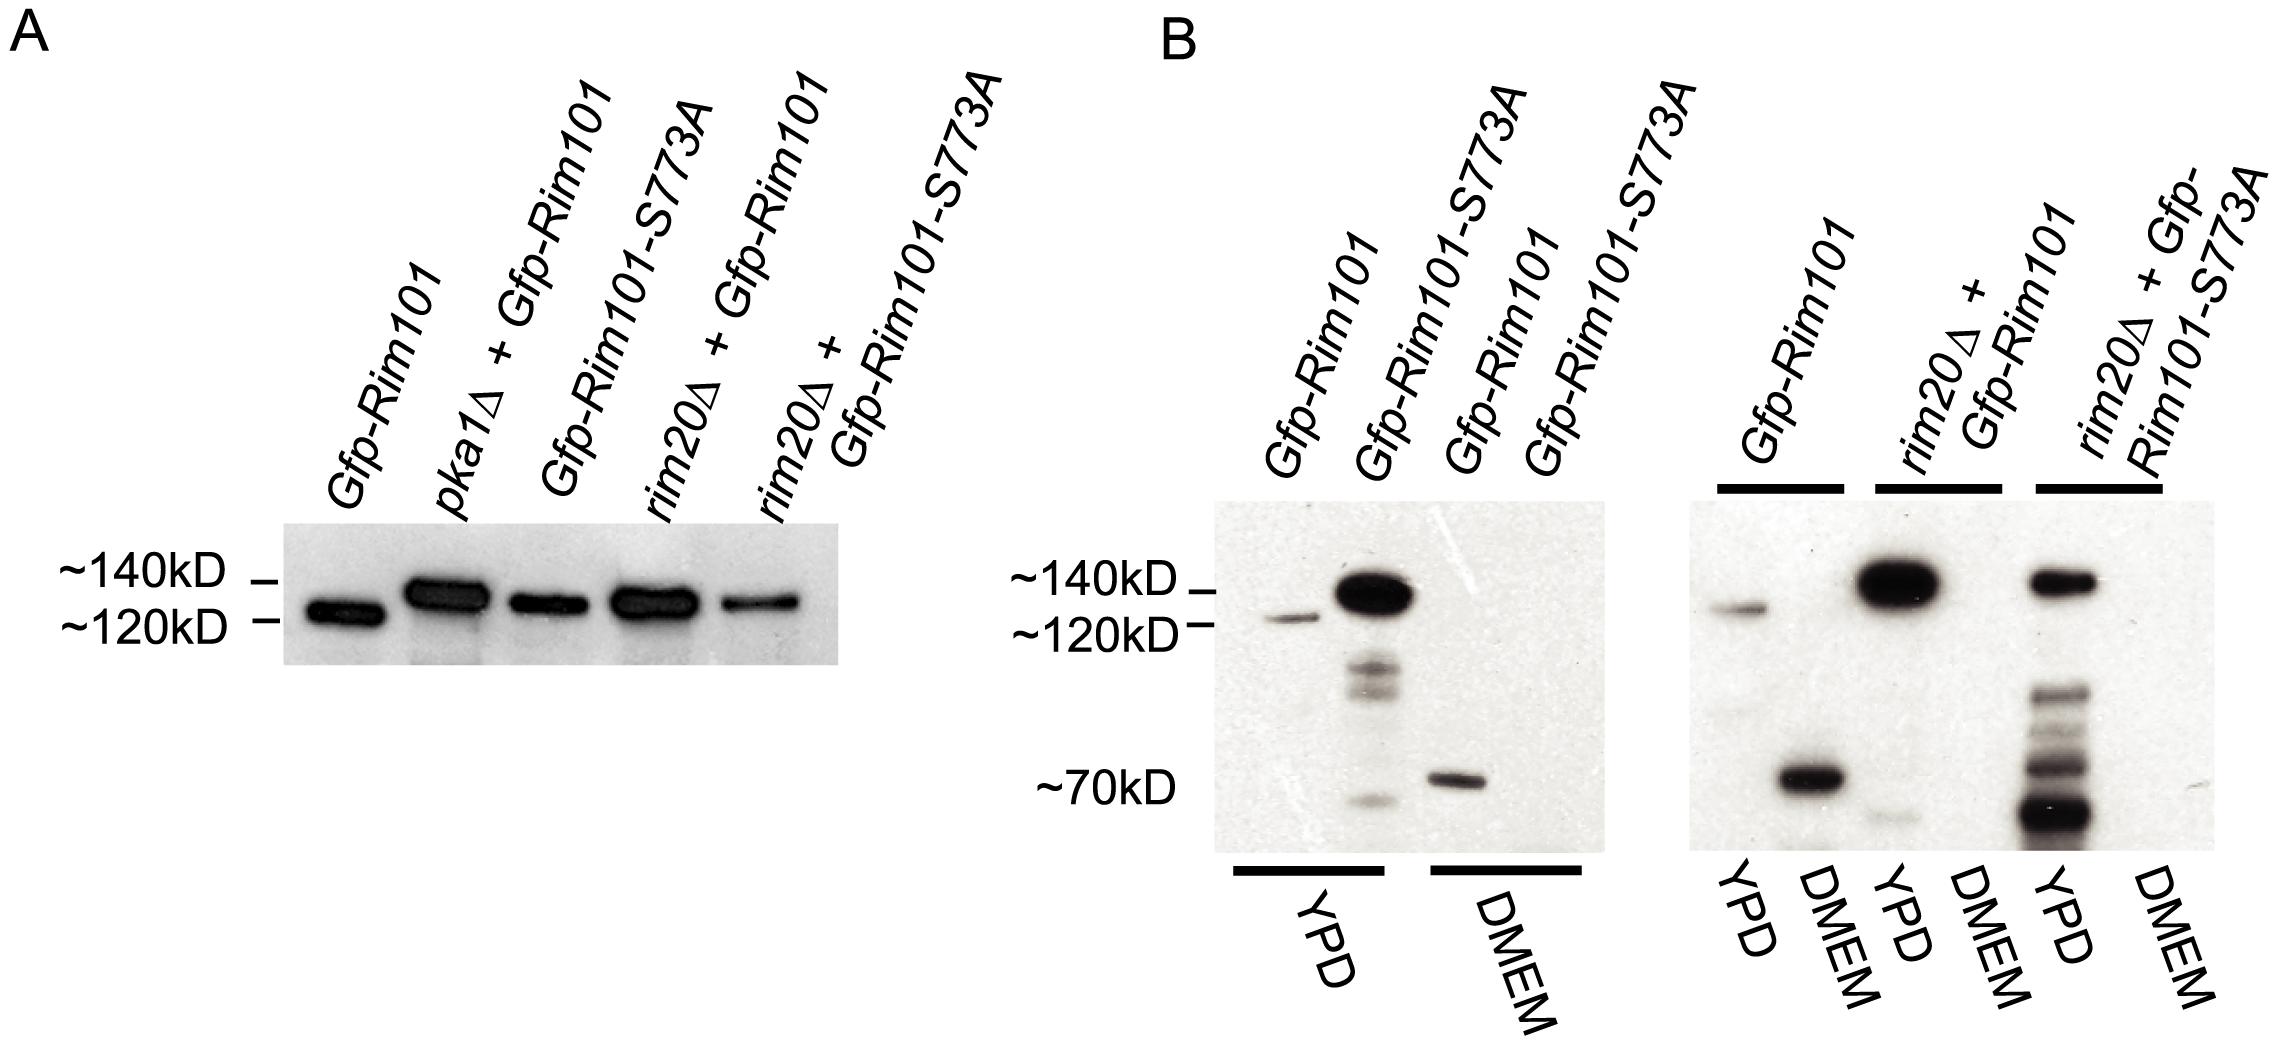 Western blot analysis of Rim101 in <i>rim101</i> and <i>pka1Δ </i><i>mutant</i> backgrounds.